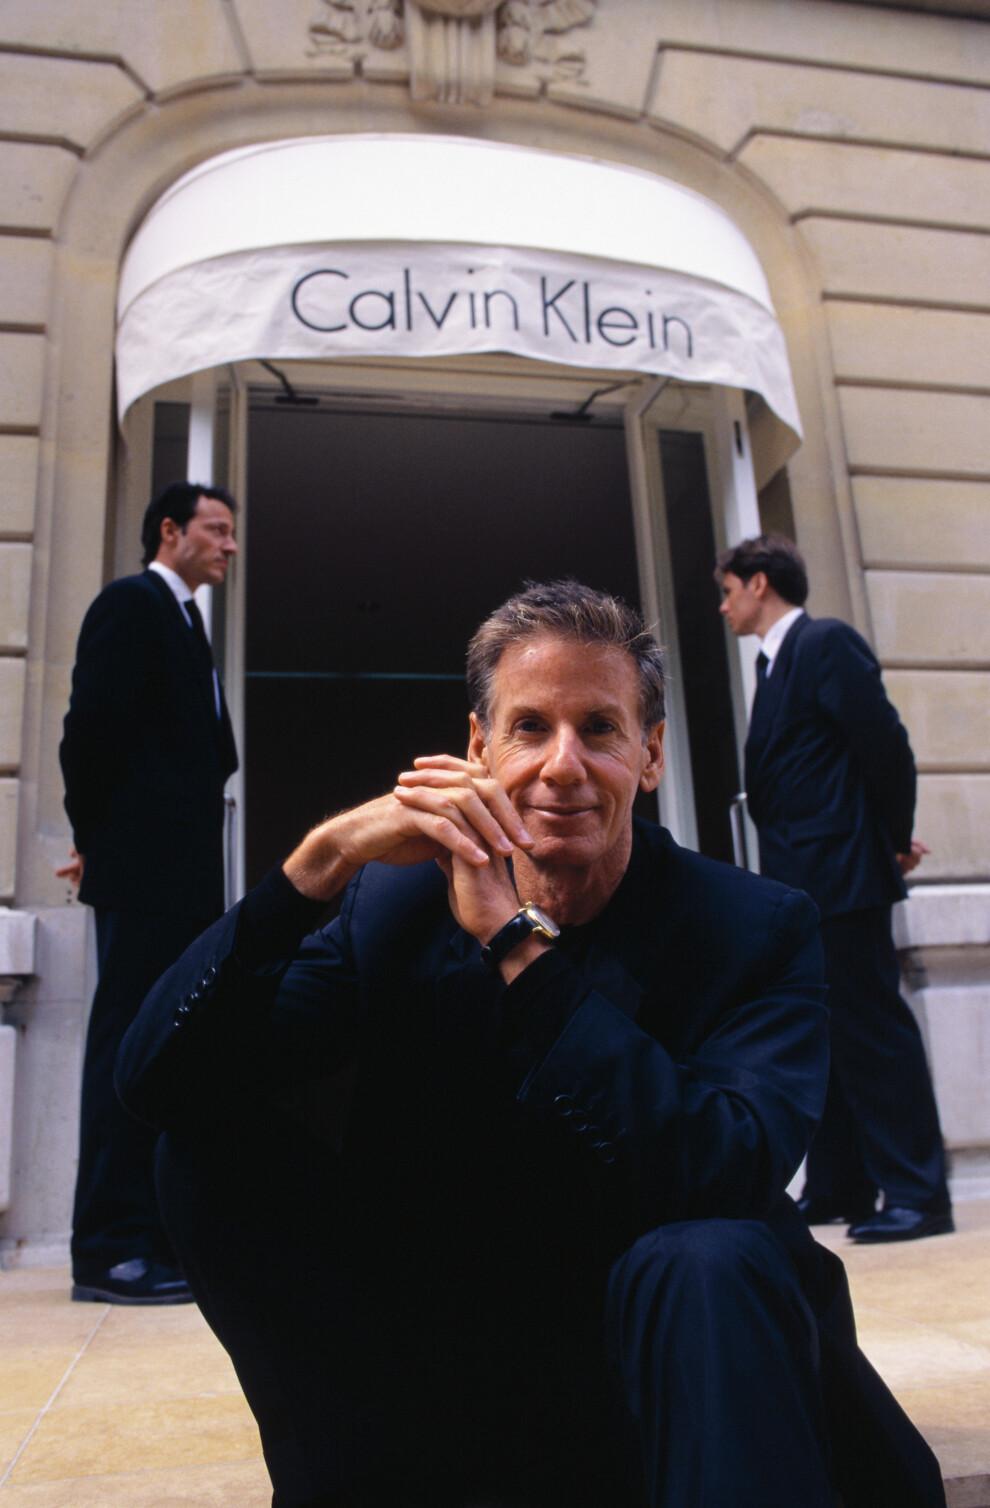 Кельвин Кляйн возле своего бутика Авеню Монтень в Париже, 1997